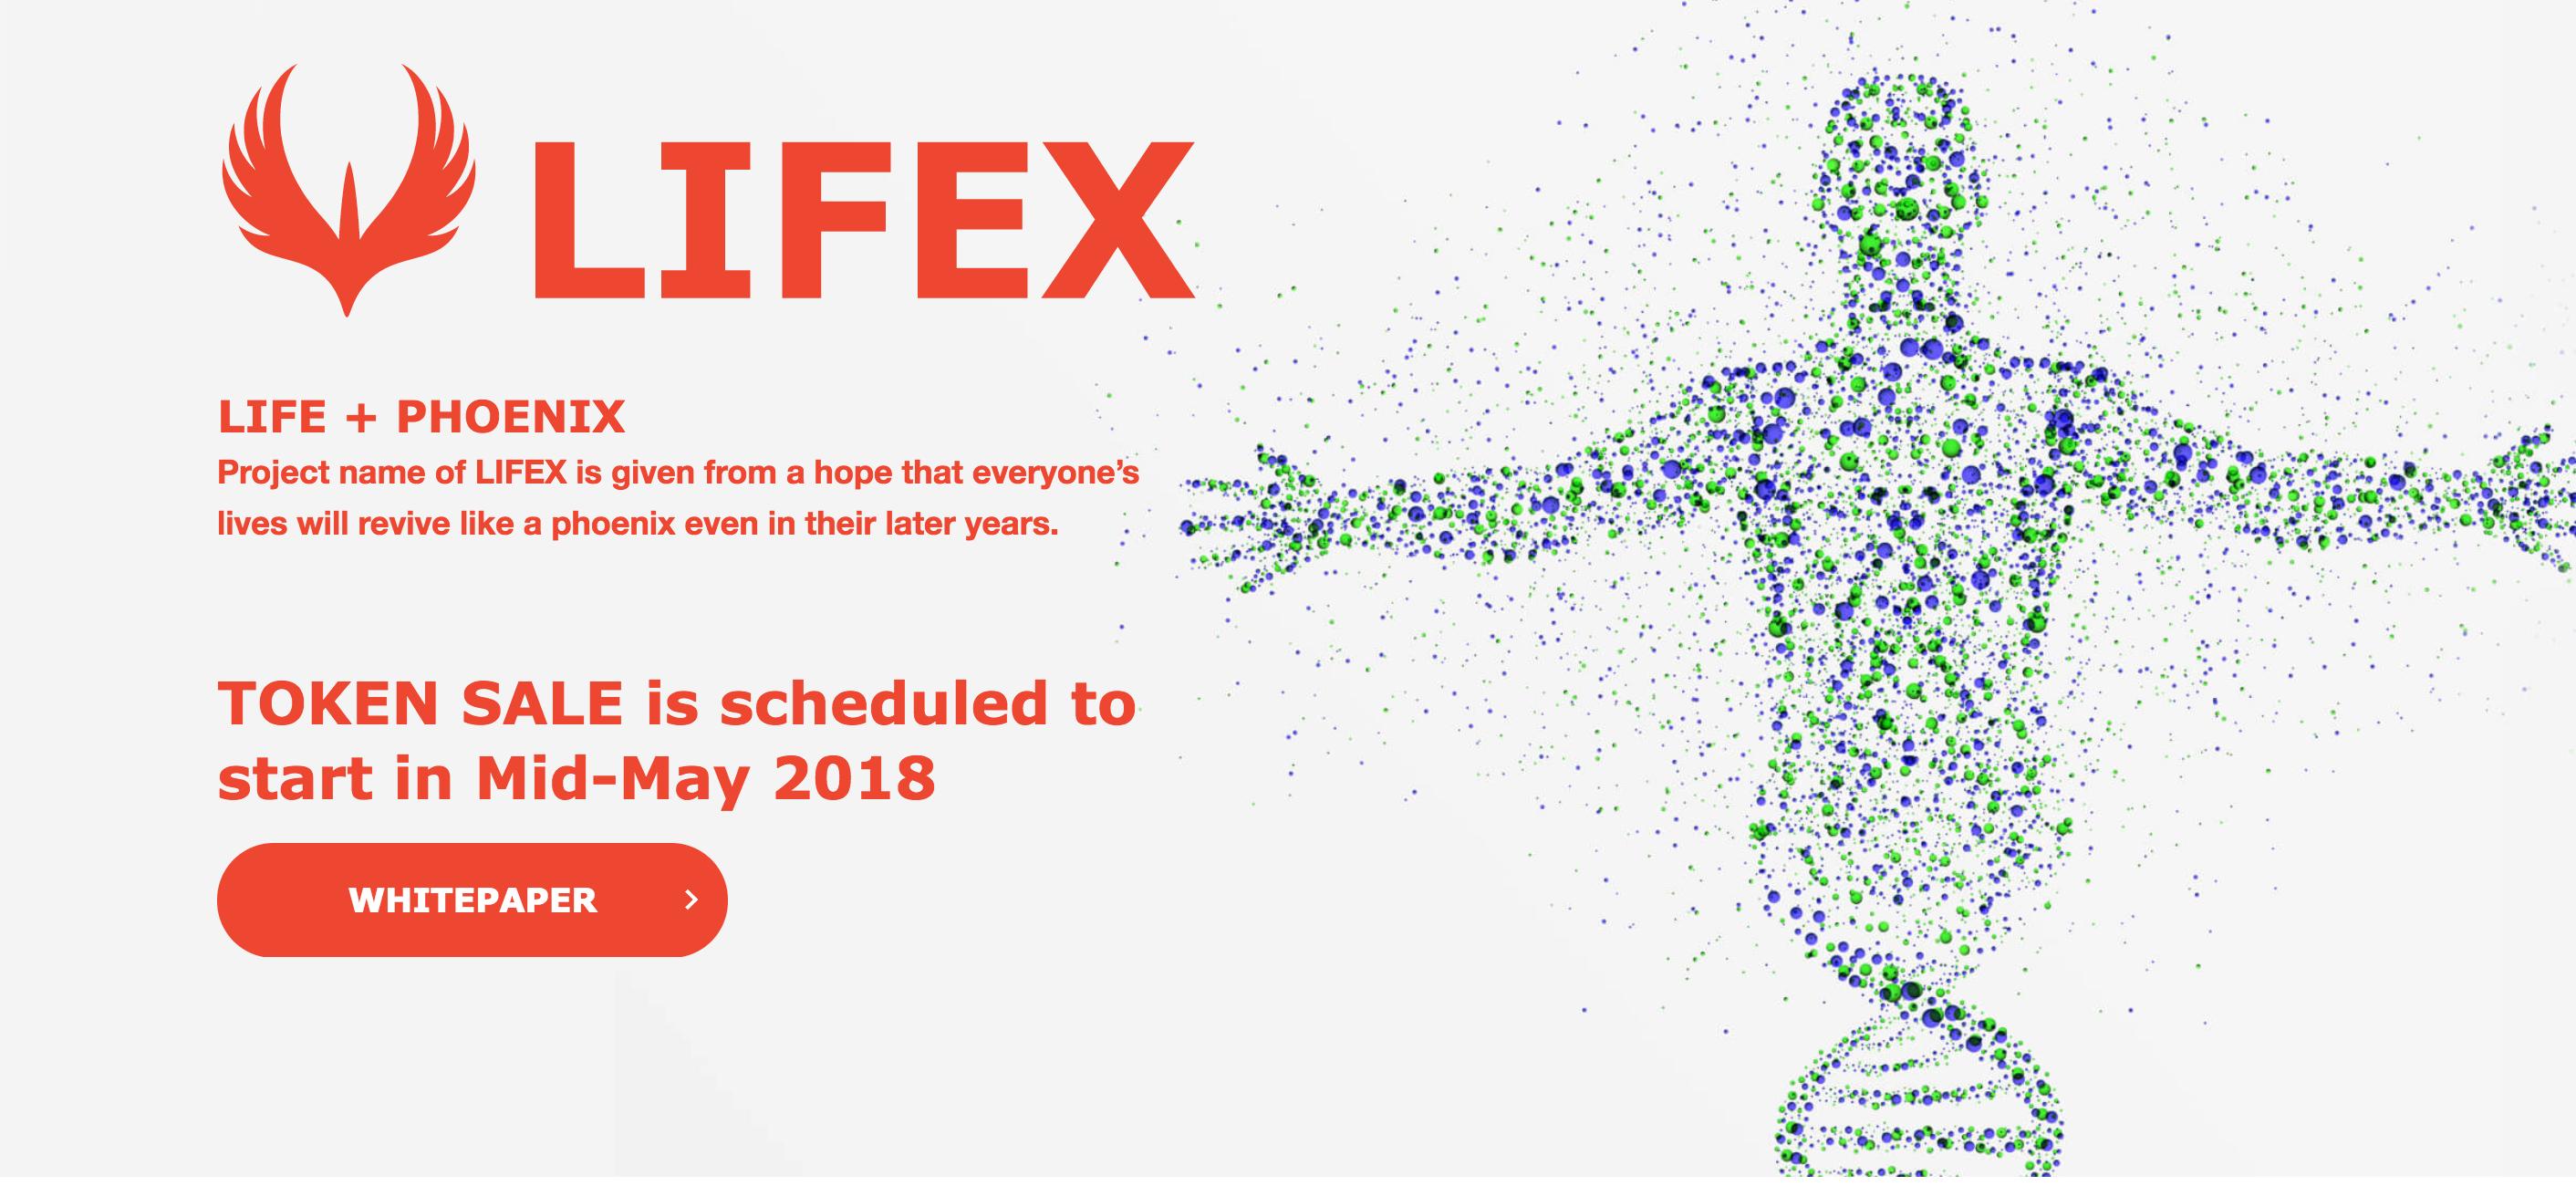 LIFEX(ライフエックス) ICO